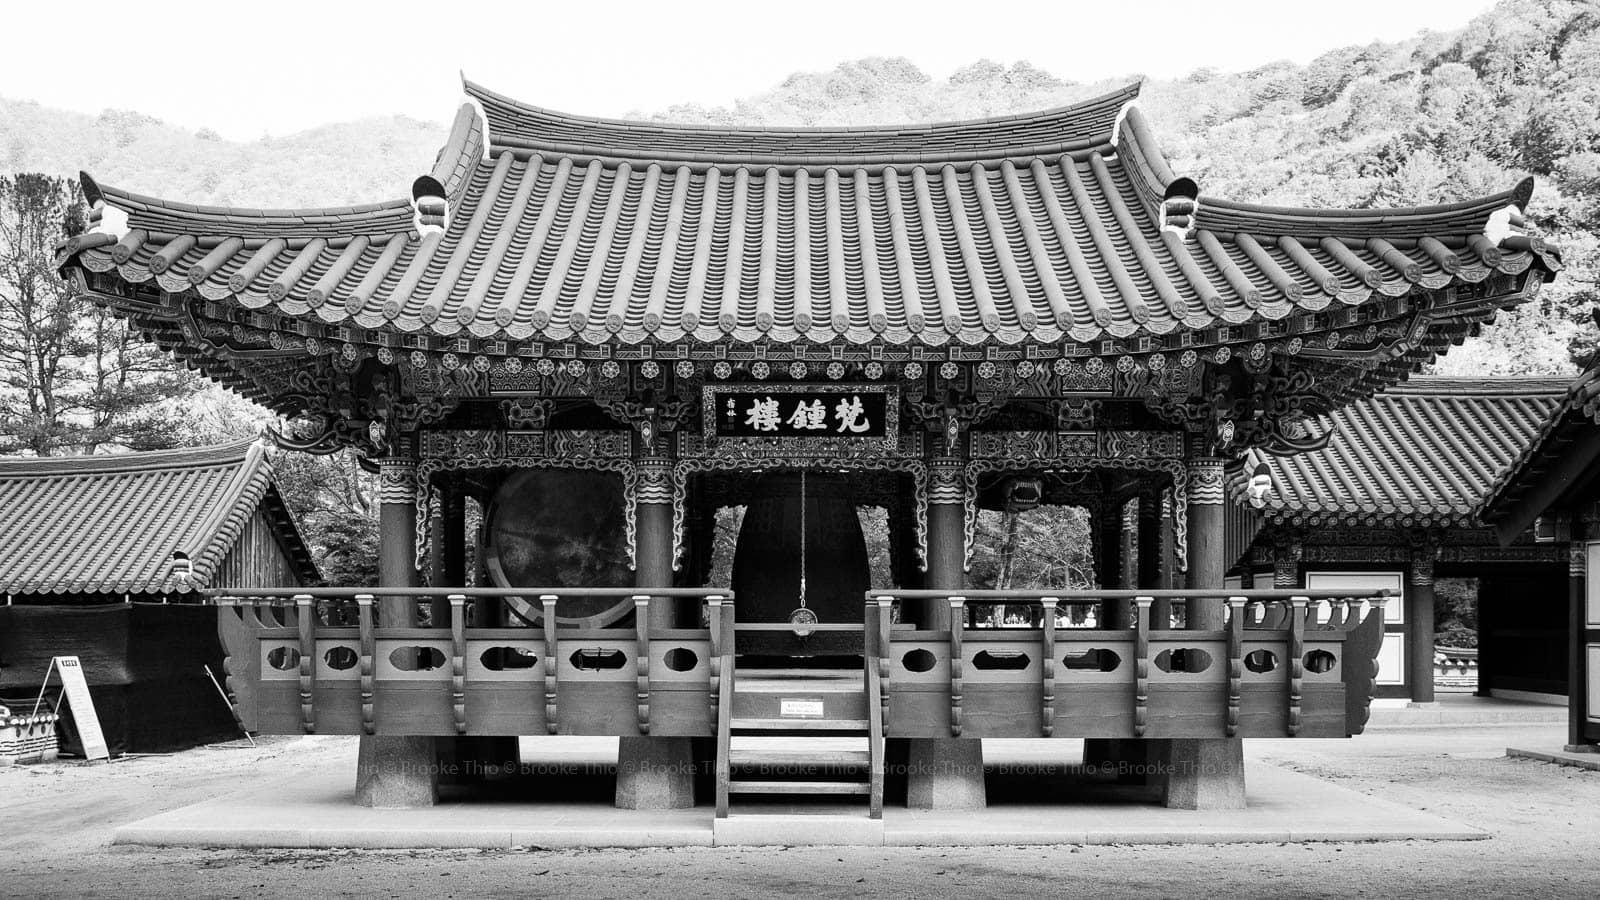 Baekdamsa Temple Bell